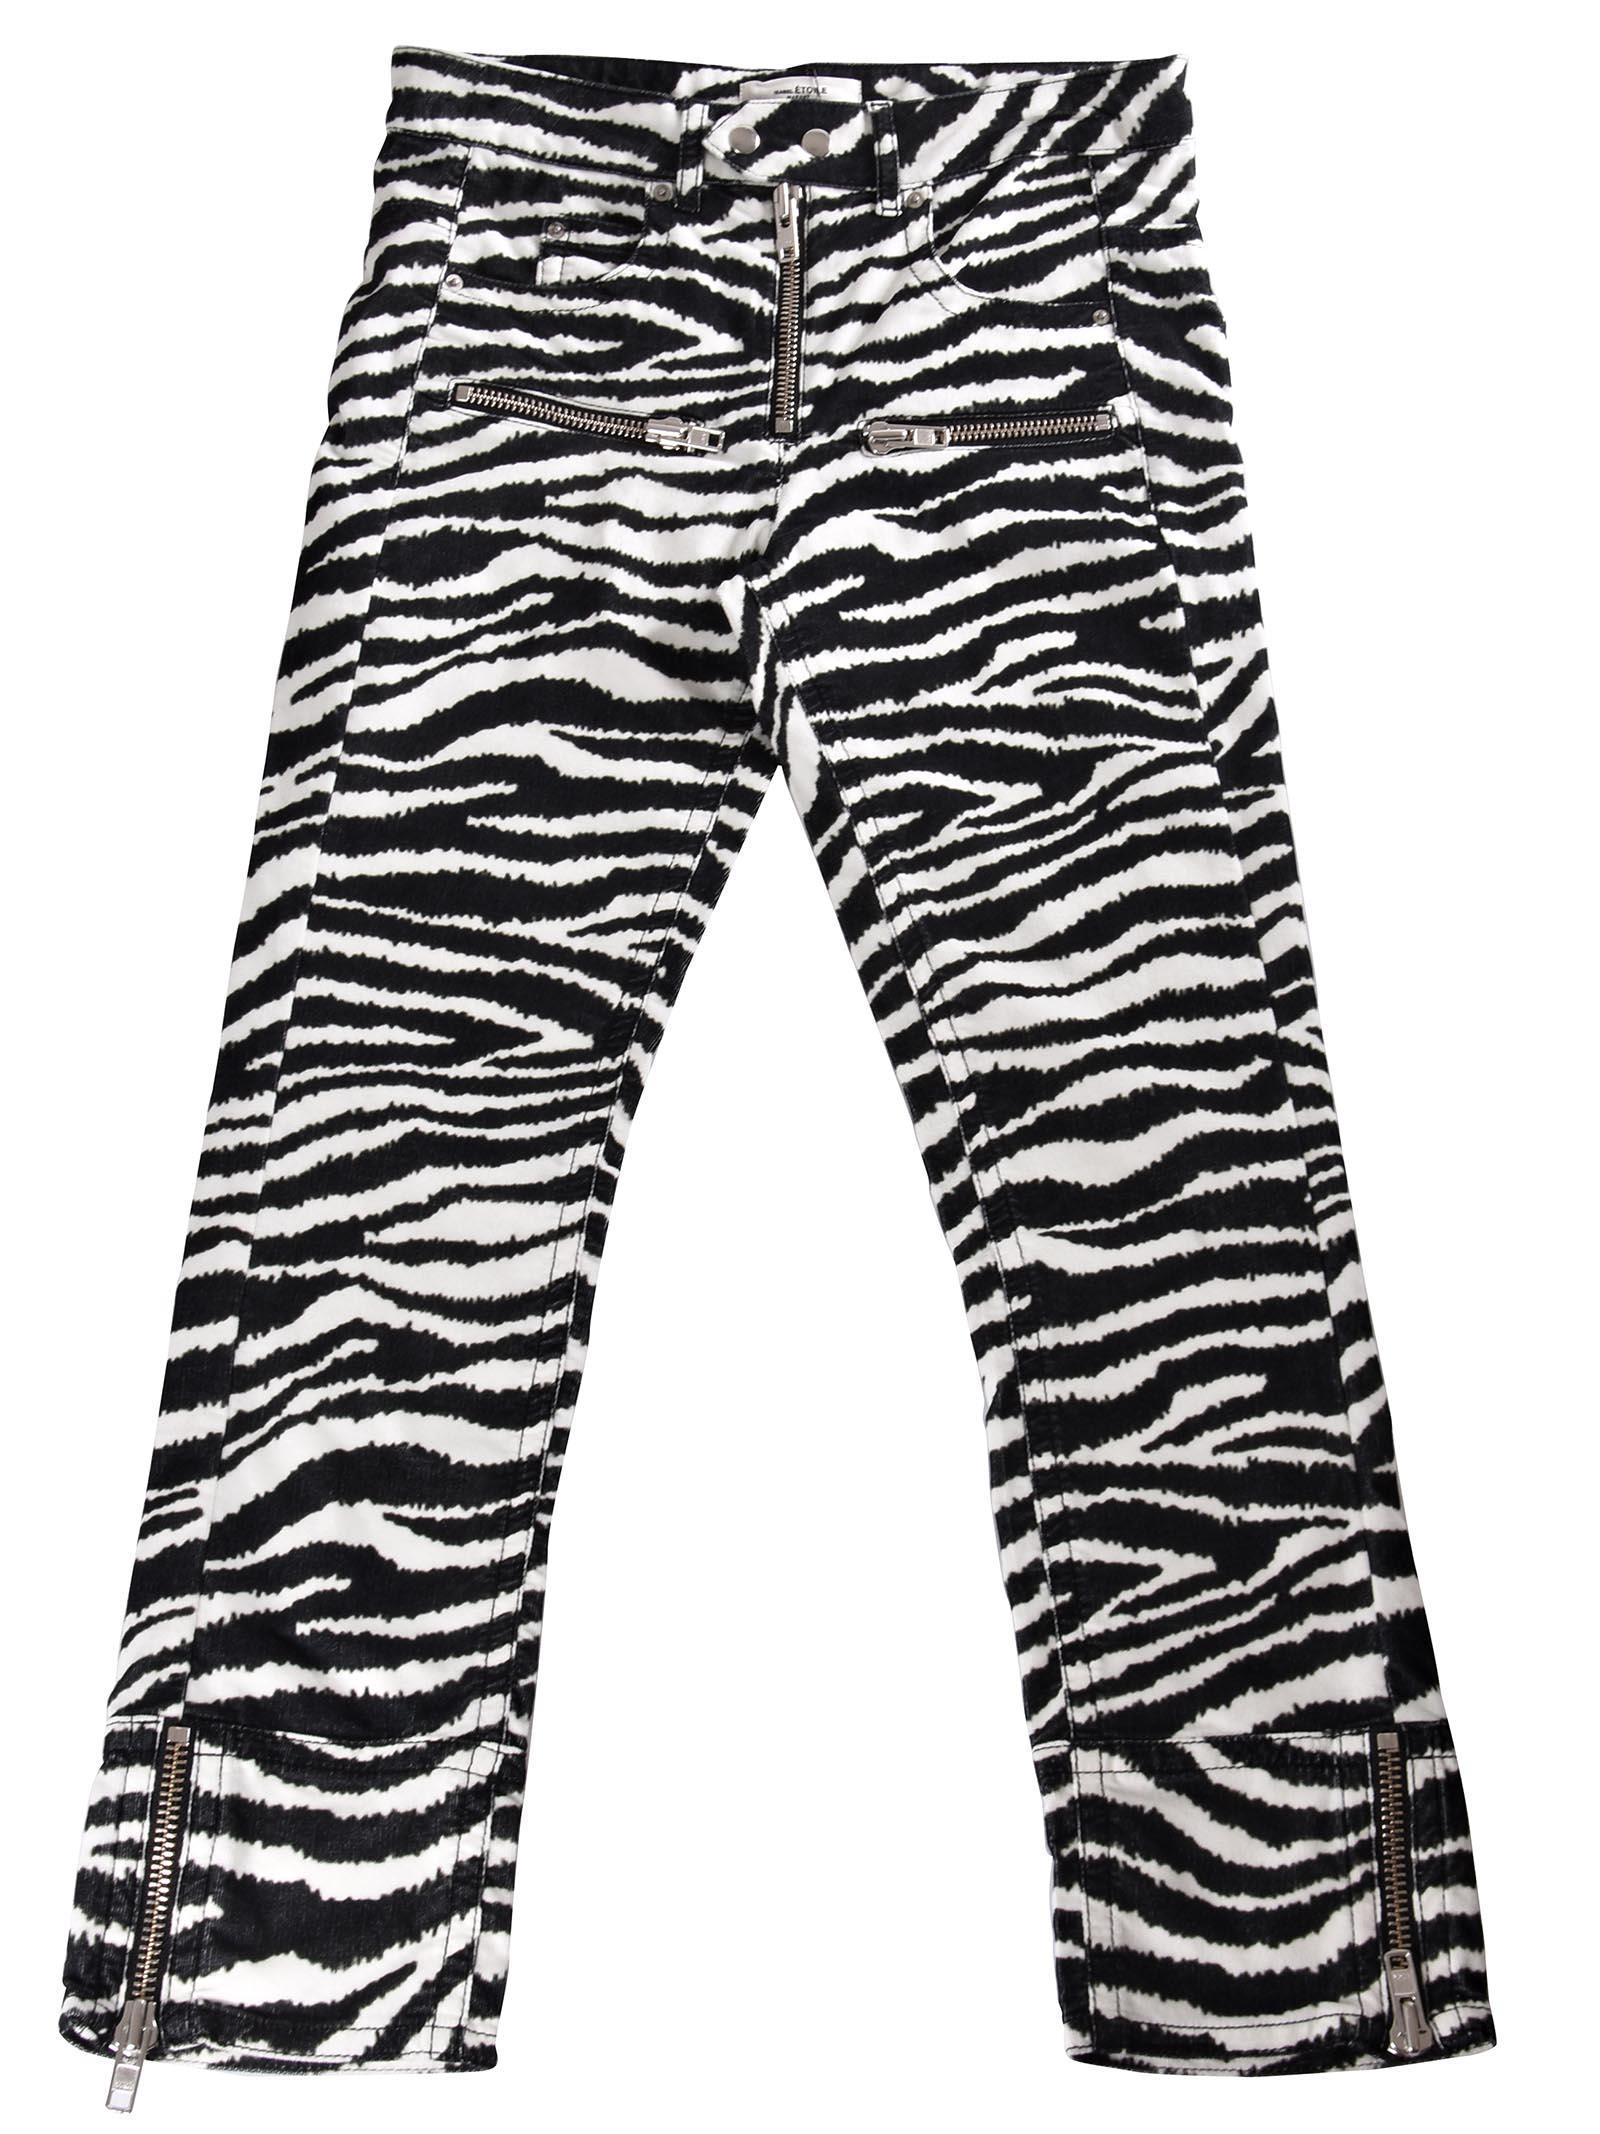 ace234eee242 Etoile Isabel Marant Isabel Marant ÉToile Black And White Alone Zebra Print  Cotton Trousers